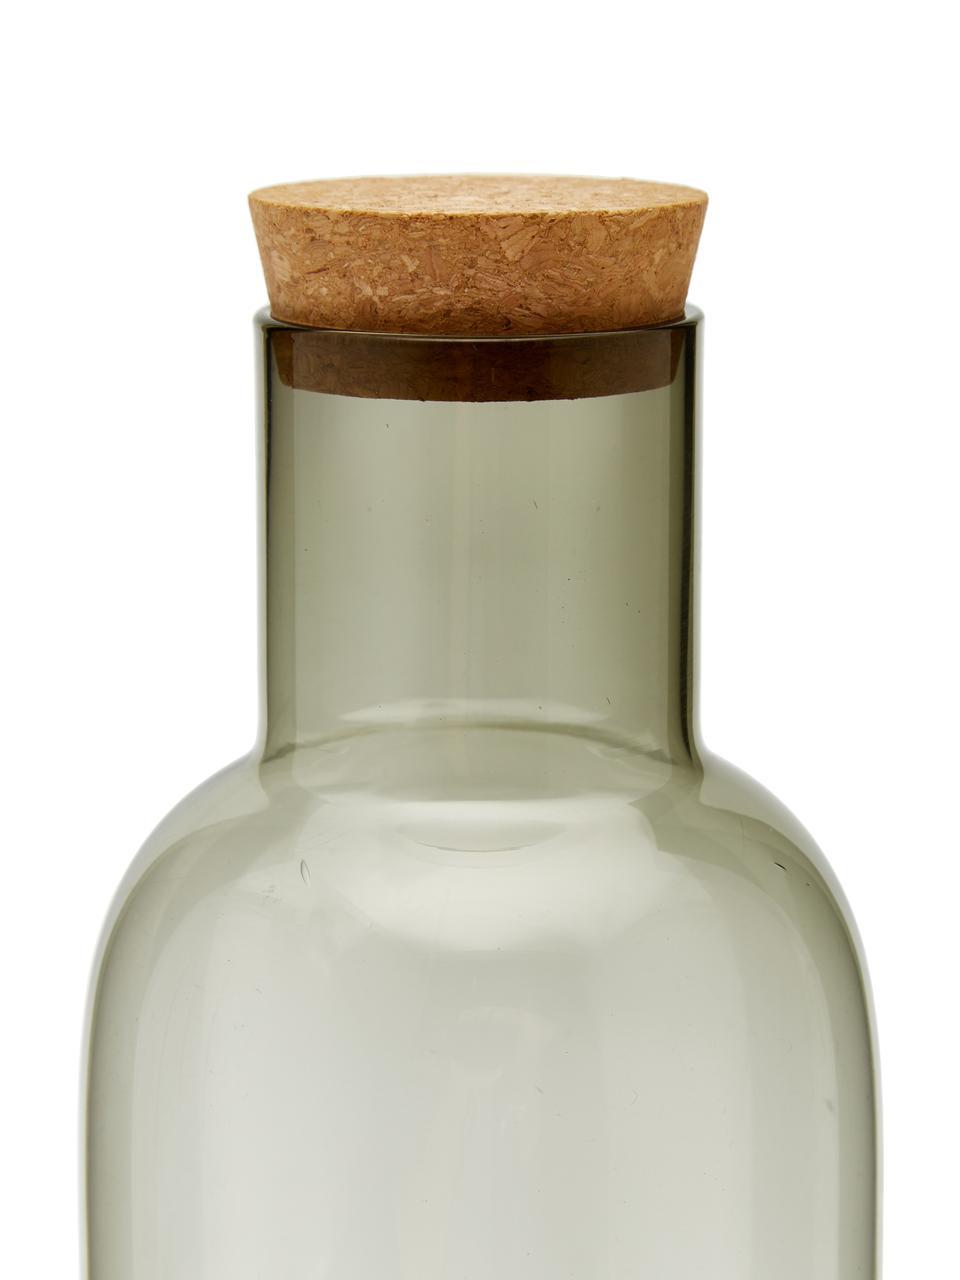 Karaf Clearance in grijs transparant, 1 L, Deksel: kurk, Grijs, transparant, 1 L